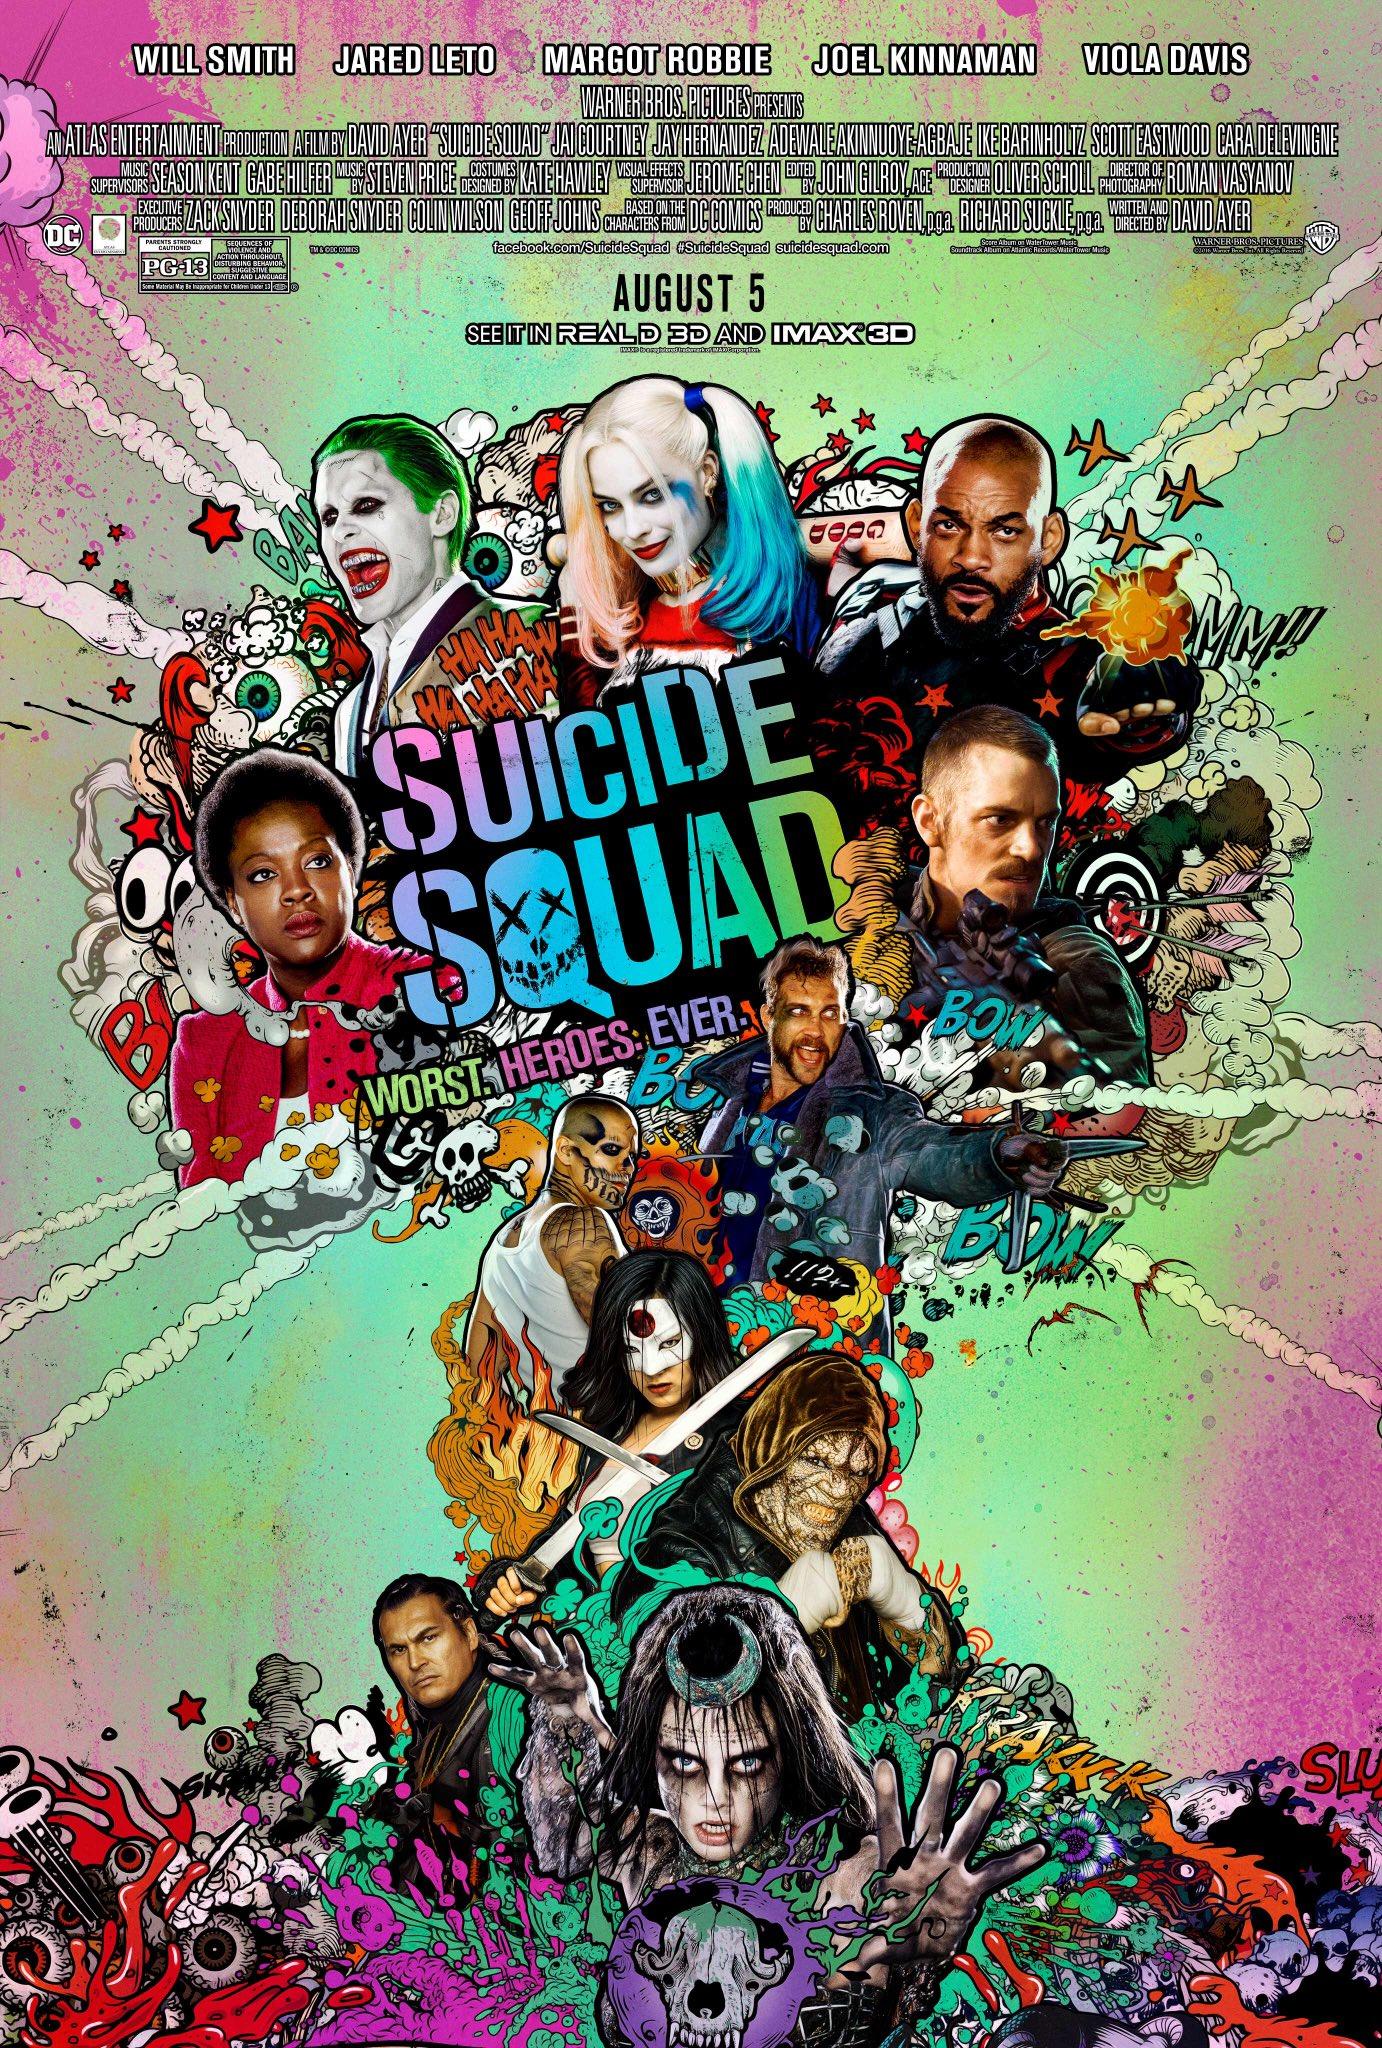 Episode 333: Suicide Squad